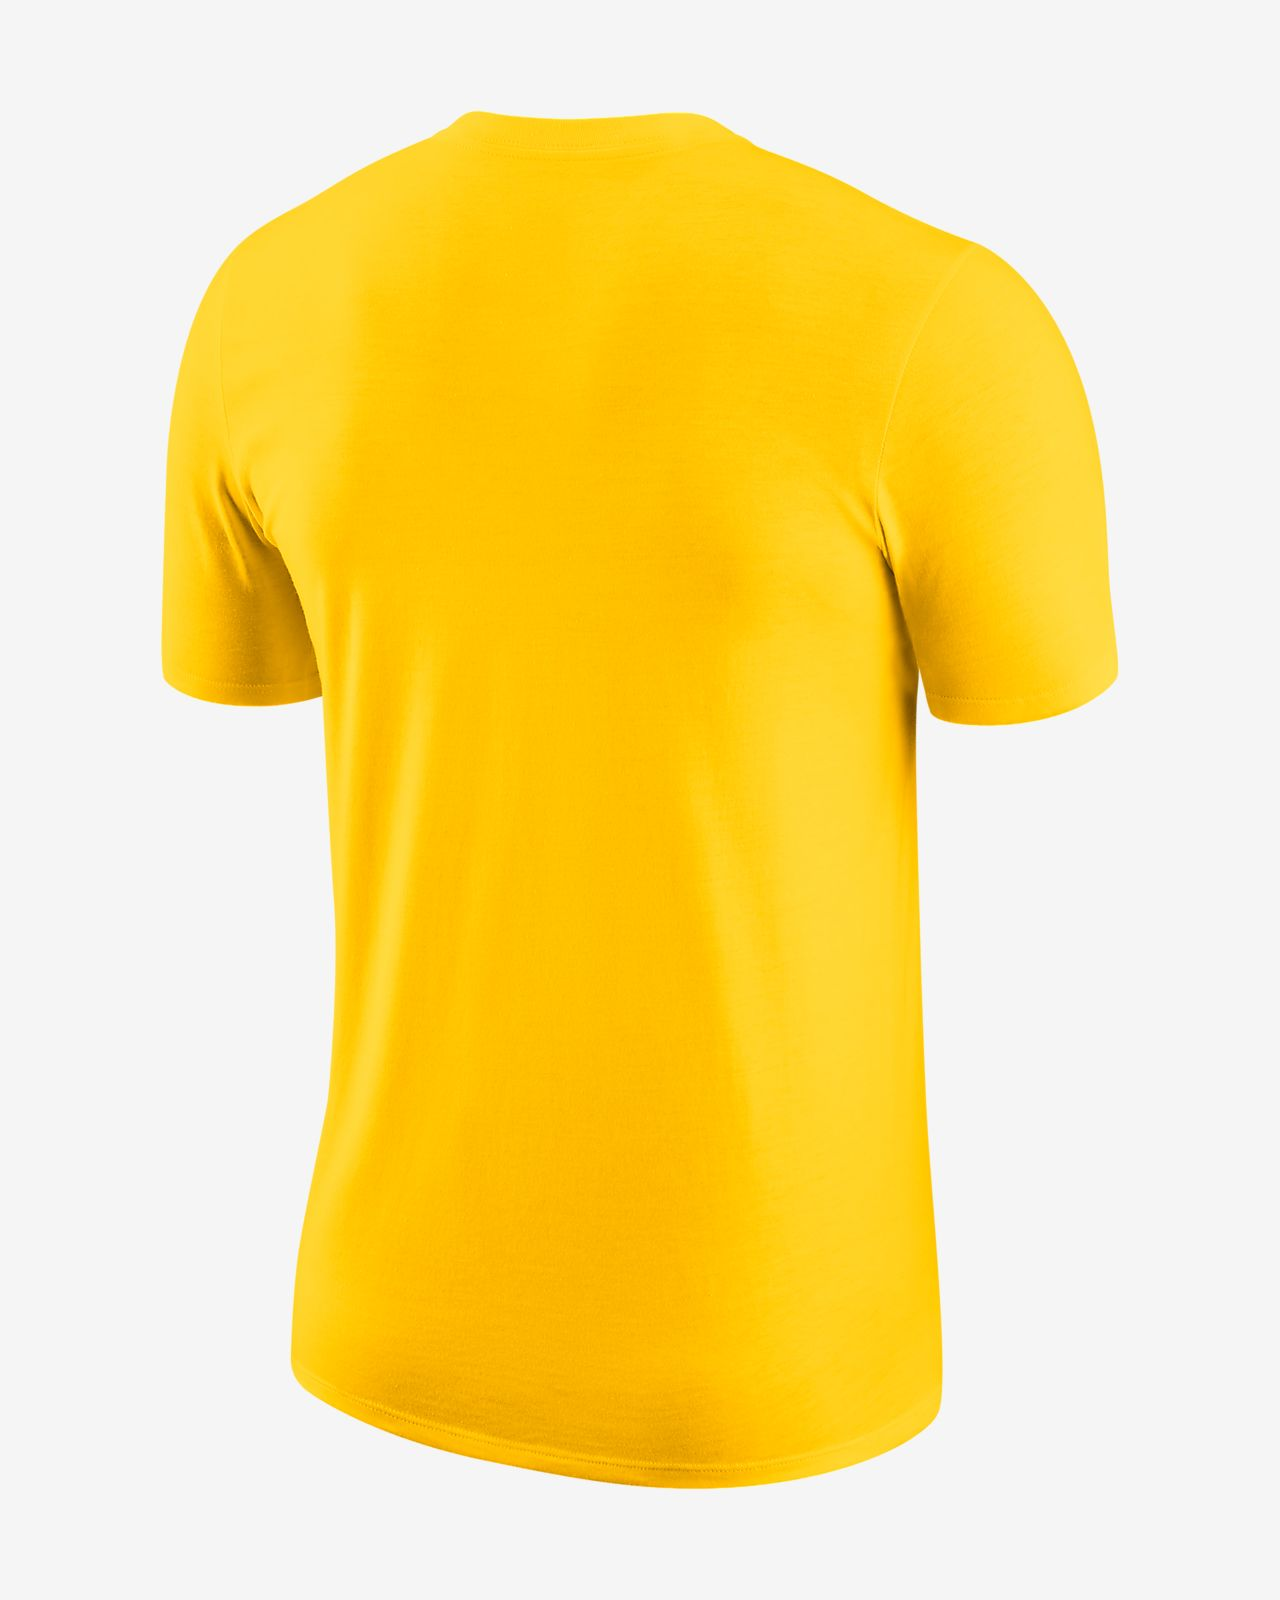 c8225ea5142 Los Angeles Lakers Nike Dri-FIT Men s NBA T-Shirt. Nike.com